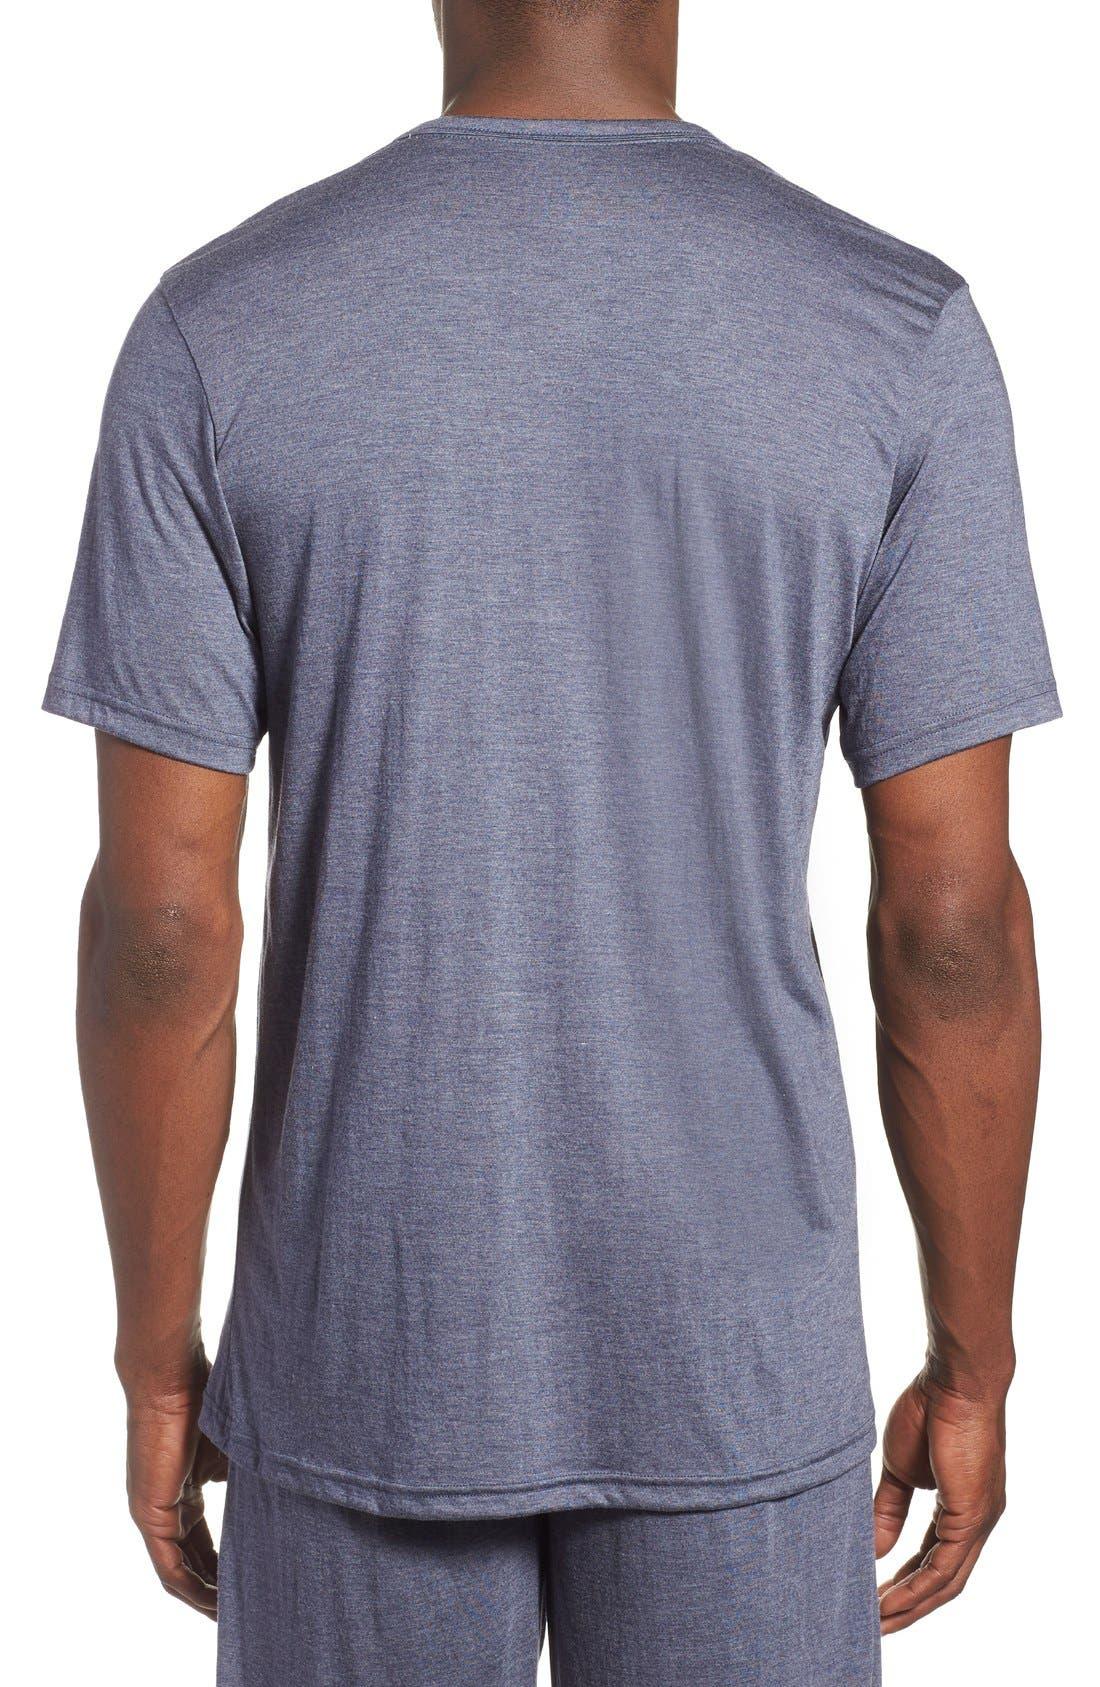 Alternate Image 2  - Calvin Klein 'Liquid Lounge' V-Neck T-Shirt